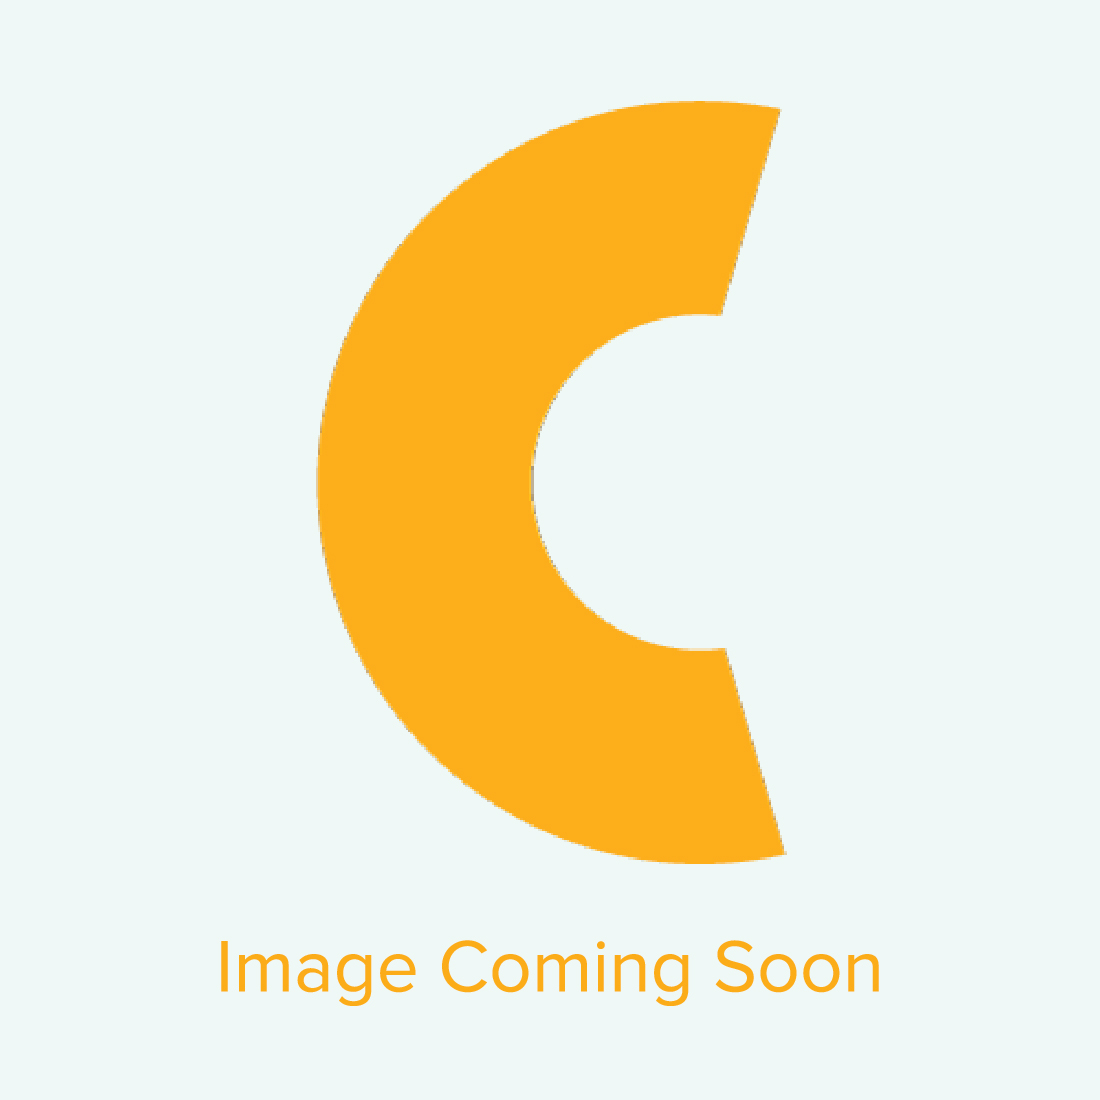 Graphtec CE6000-60 Vinyl Cutter Replacement Cutting Strip - 2/pack